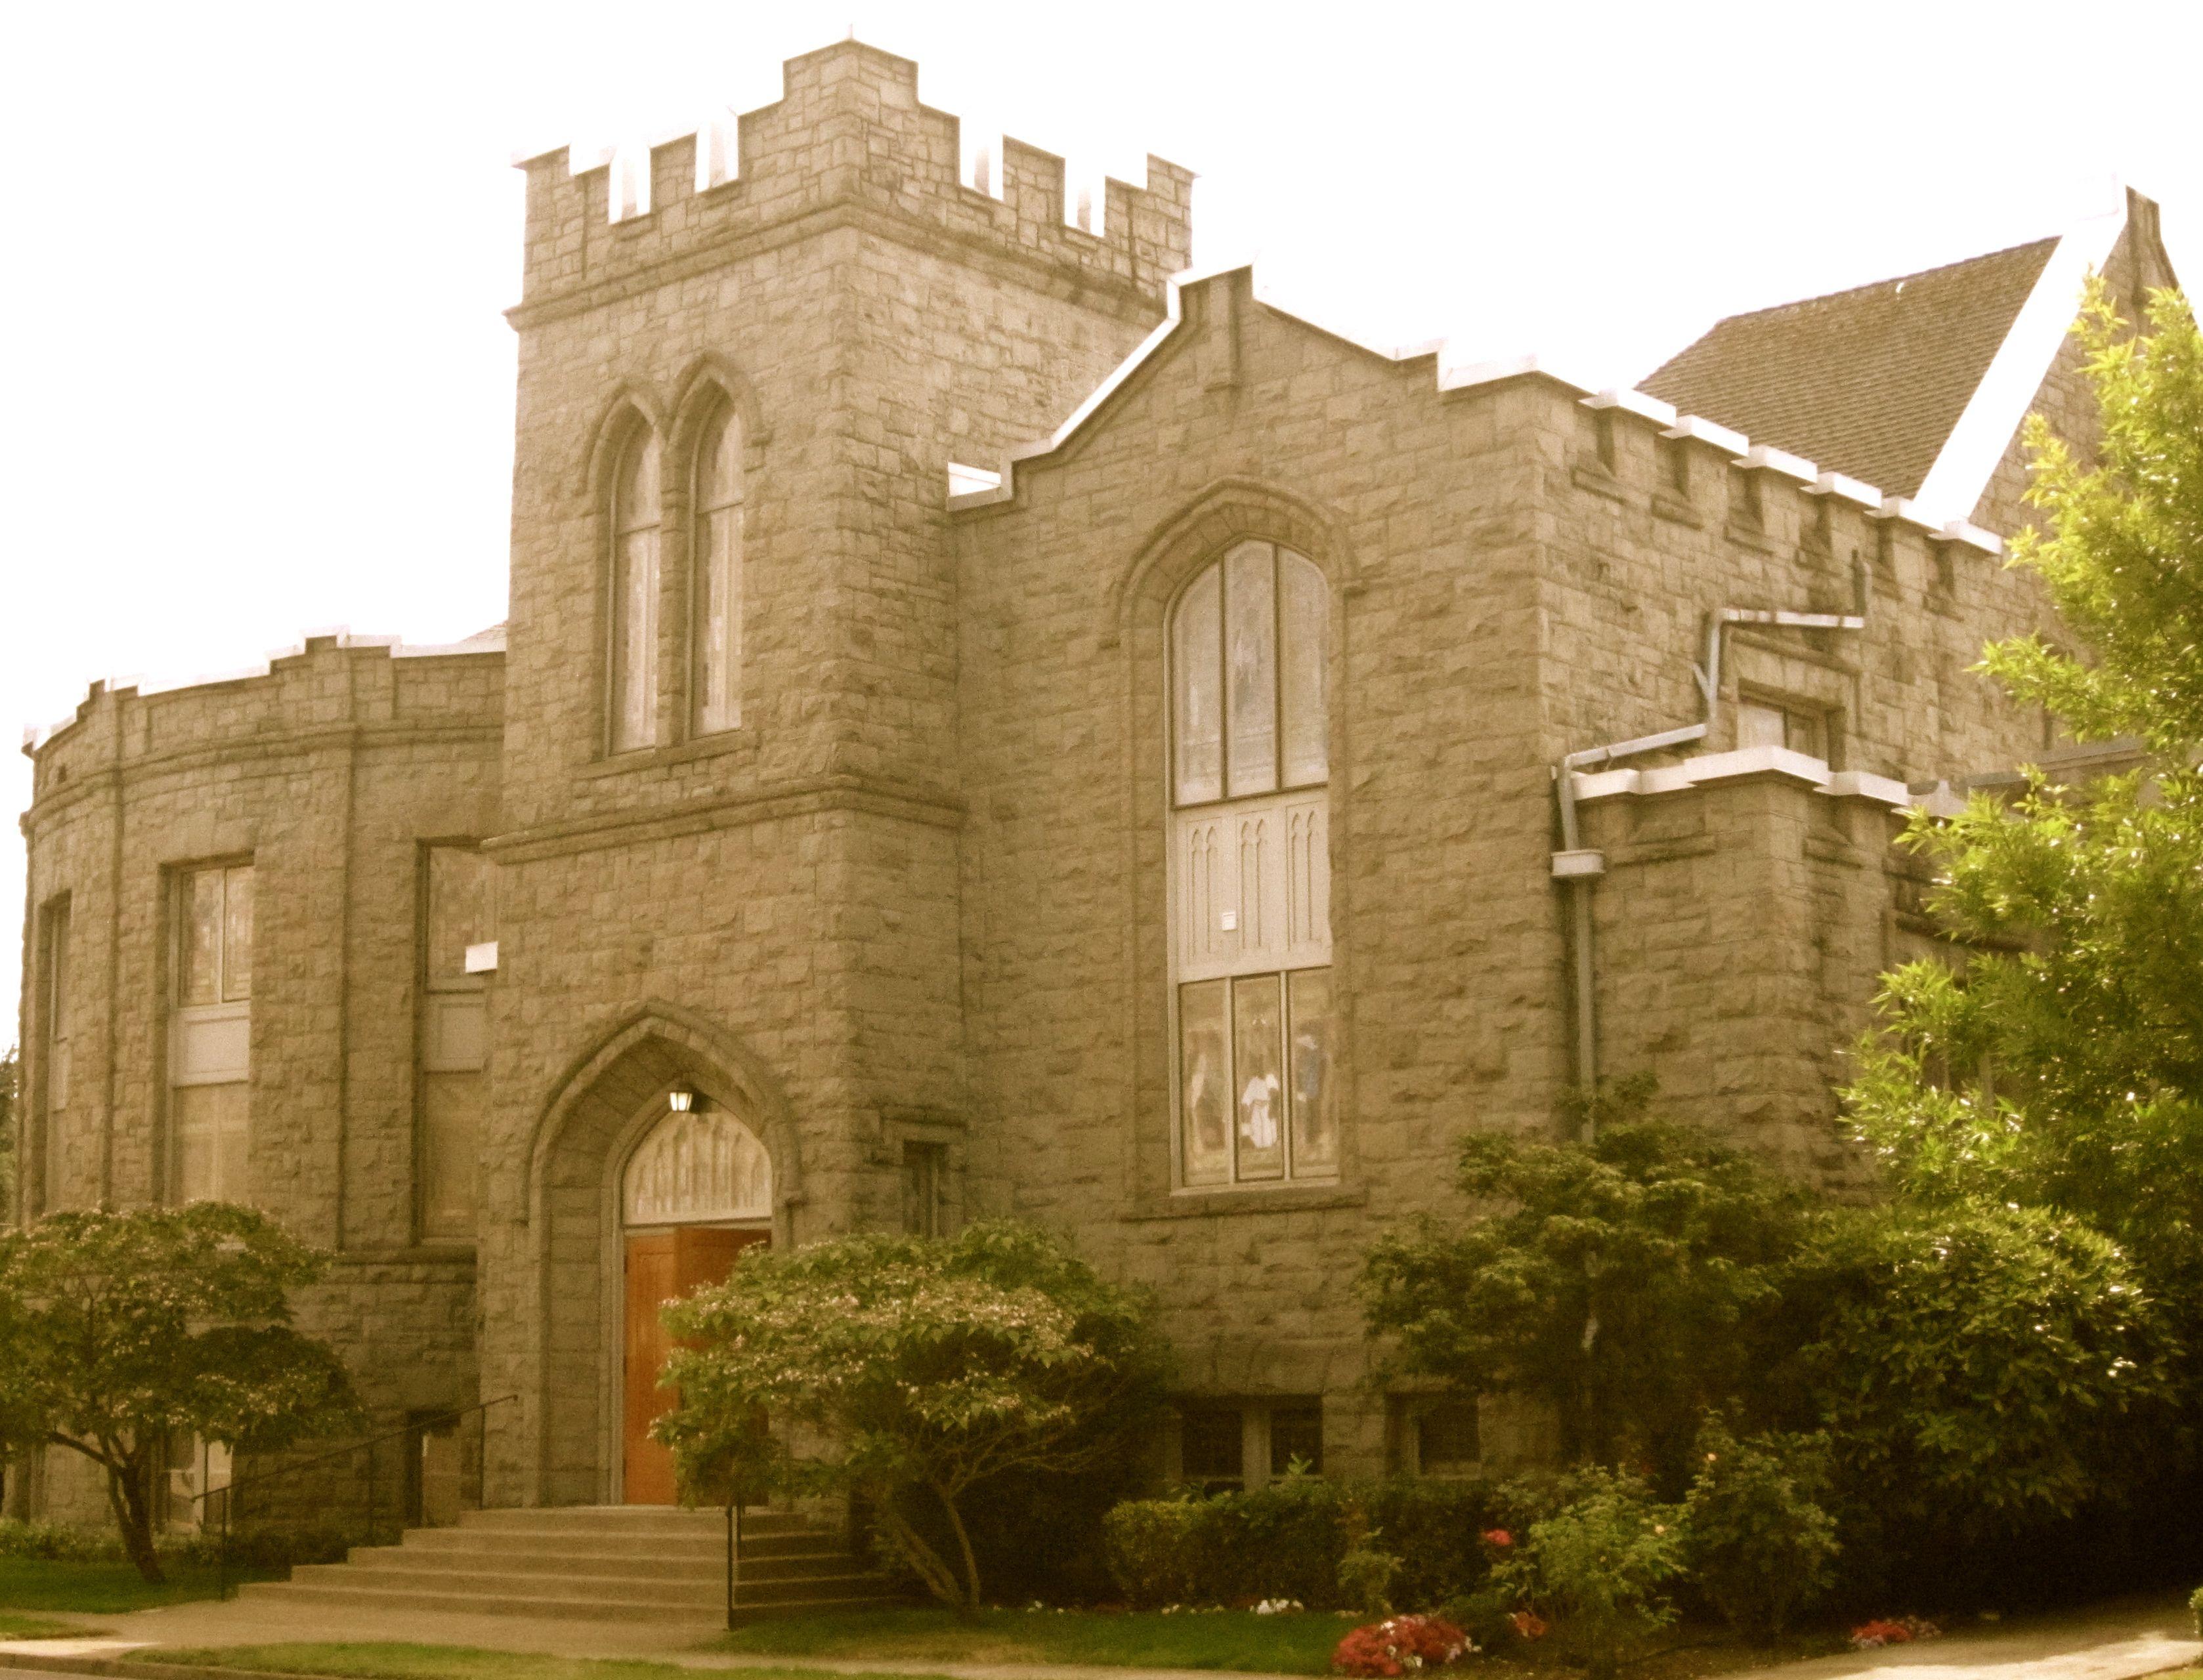 Presbyterian Church monteithdistrict albanyoregon